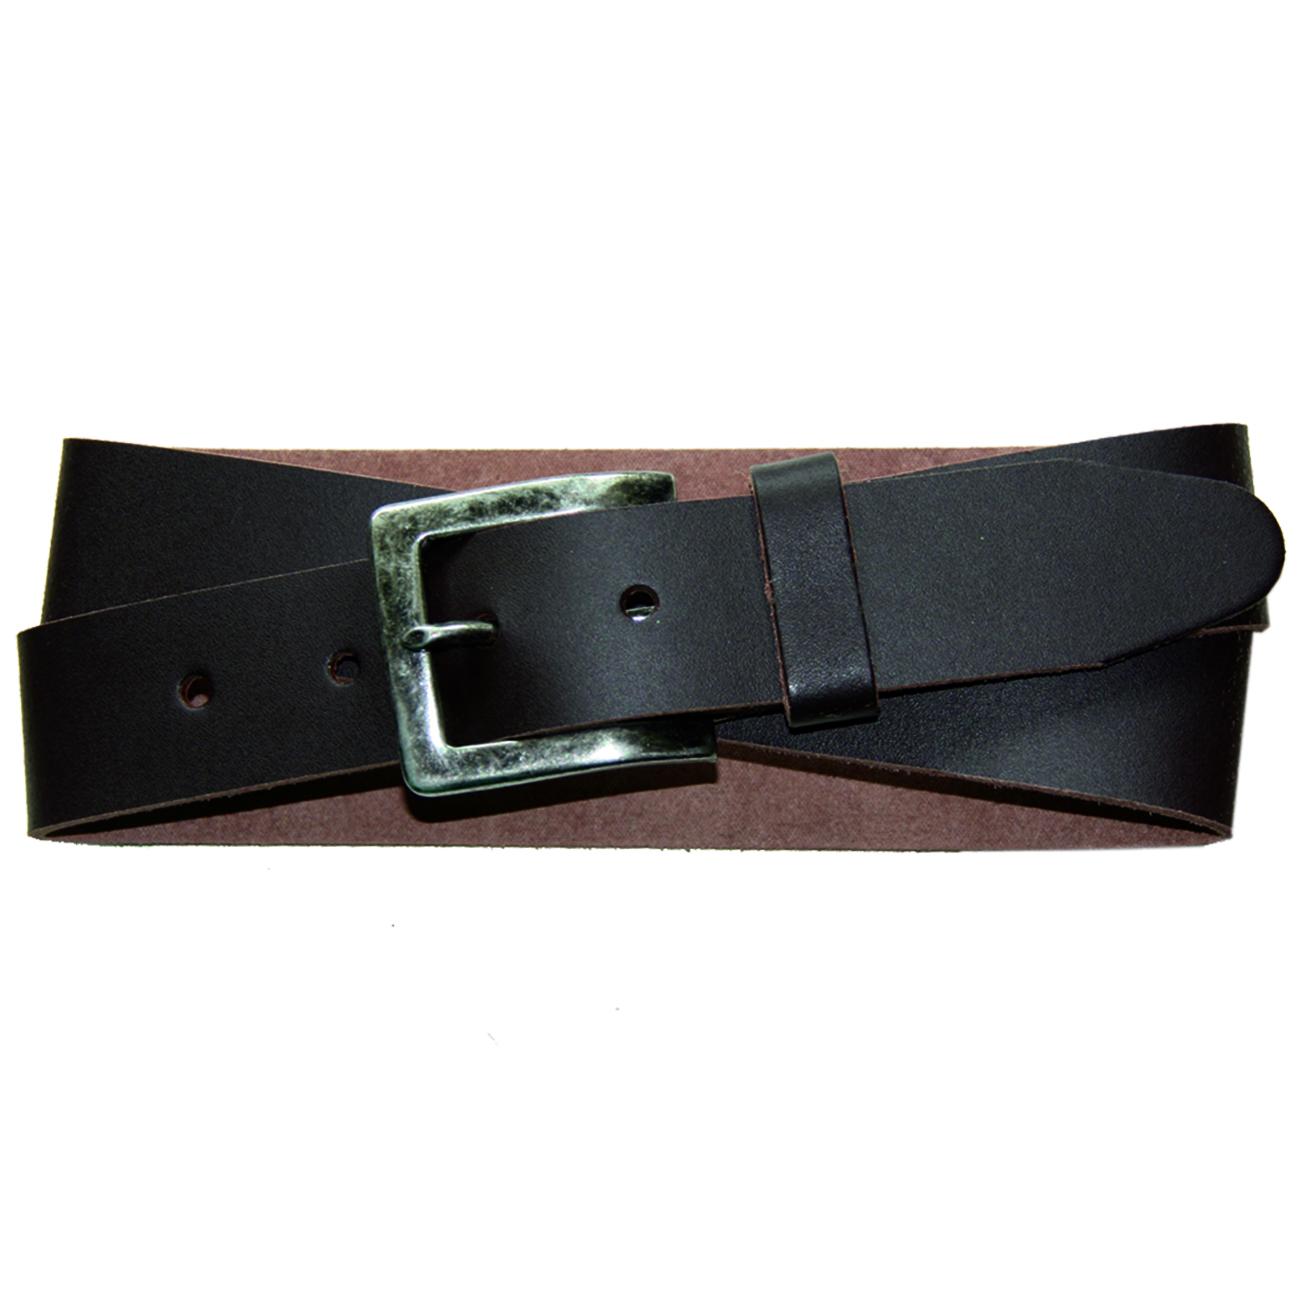 PETROL Industries Ledergürtel Leder Gürtel braun PE16 40092 brown